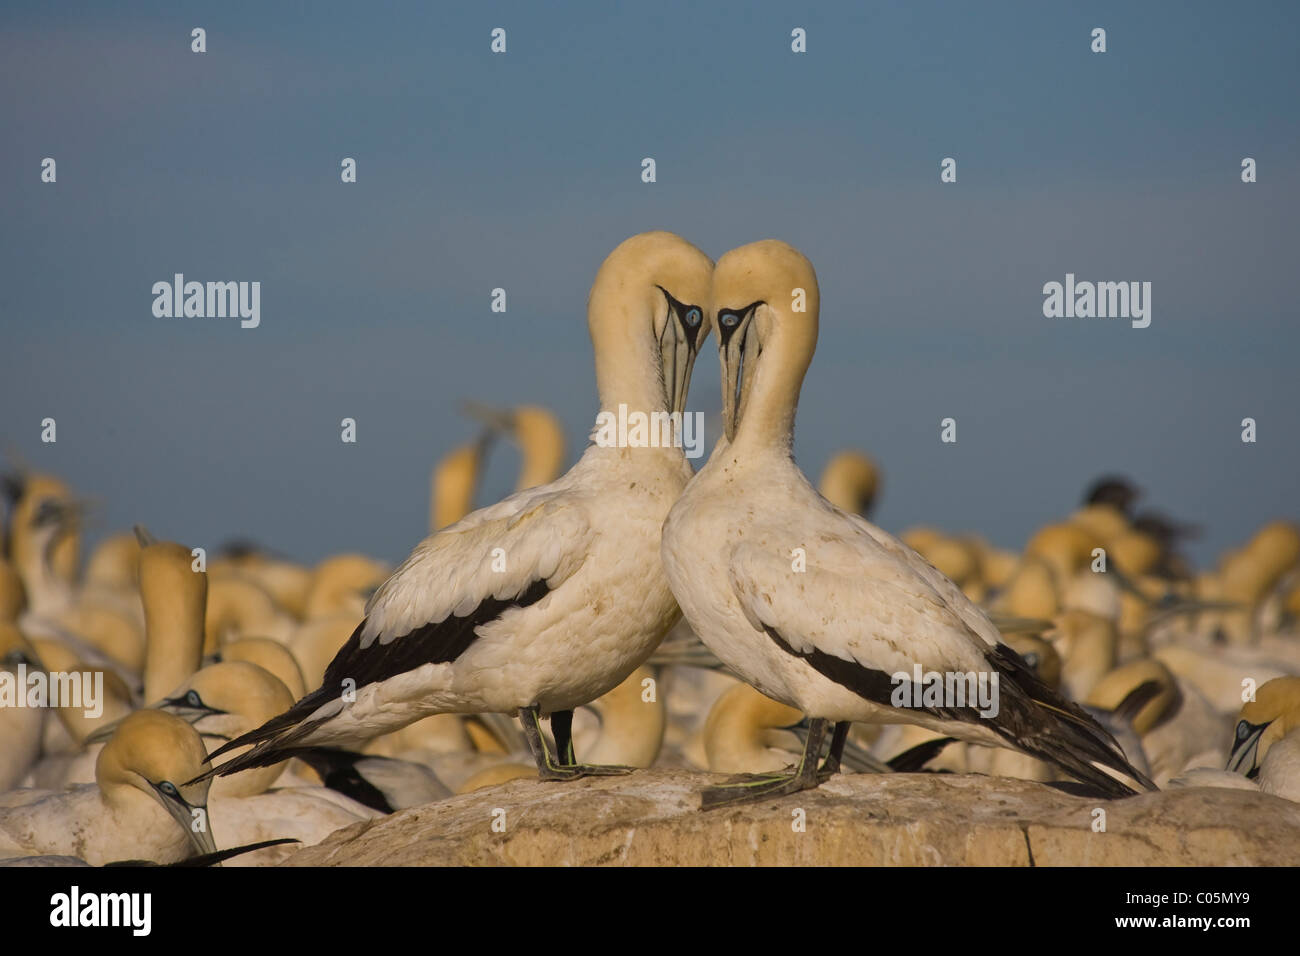 Cape Gannets Preening, Bird Island, South Africa - Stock Image